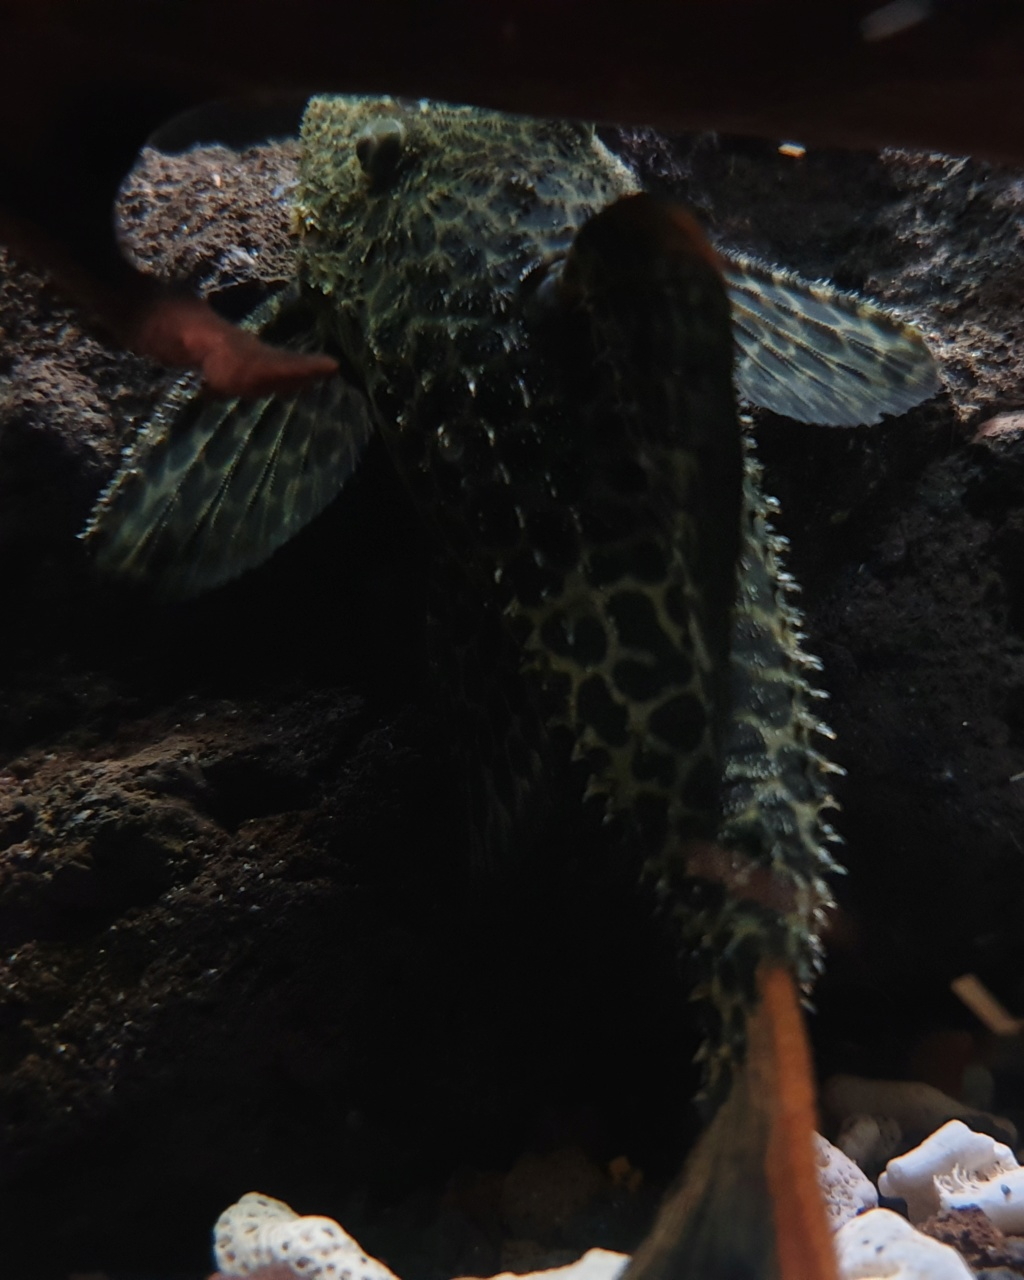 Pseudacanthicus leopardus (Fowler, 1914) - L114  - Página 4 20190719